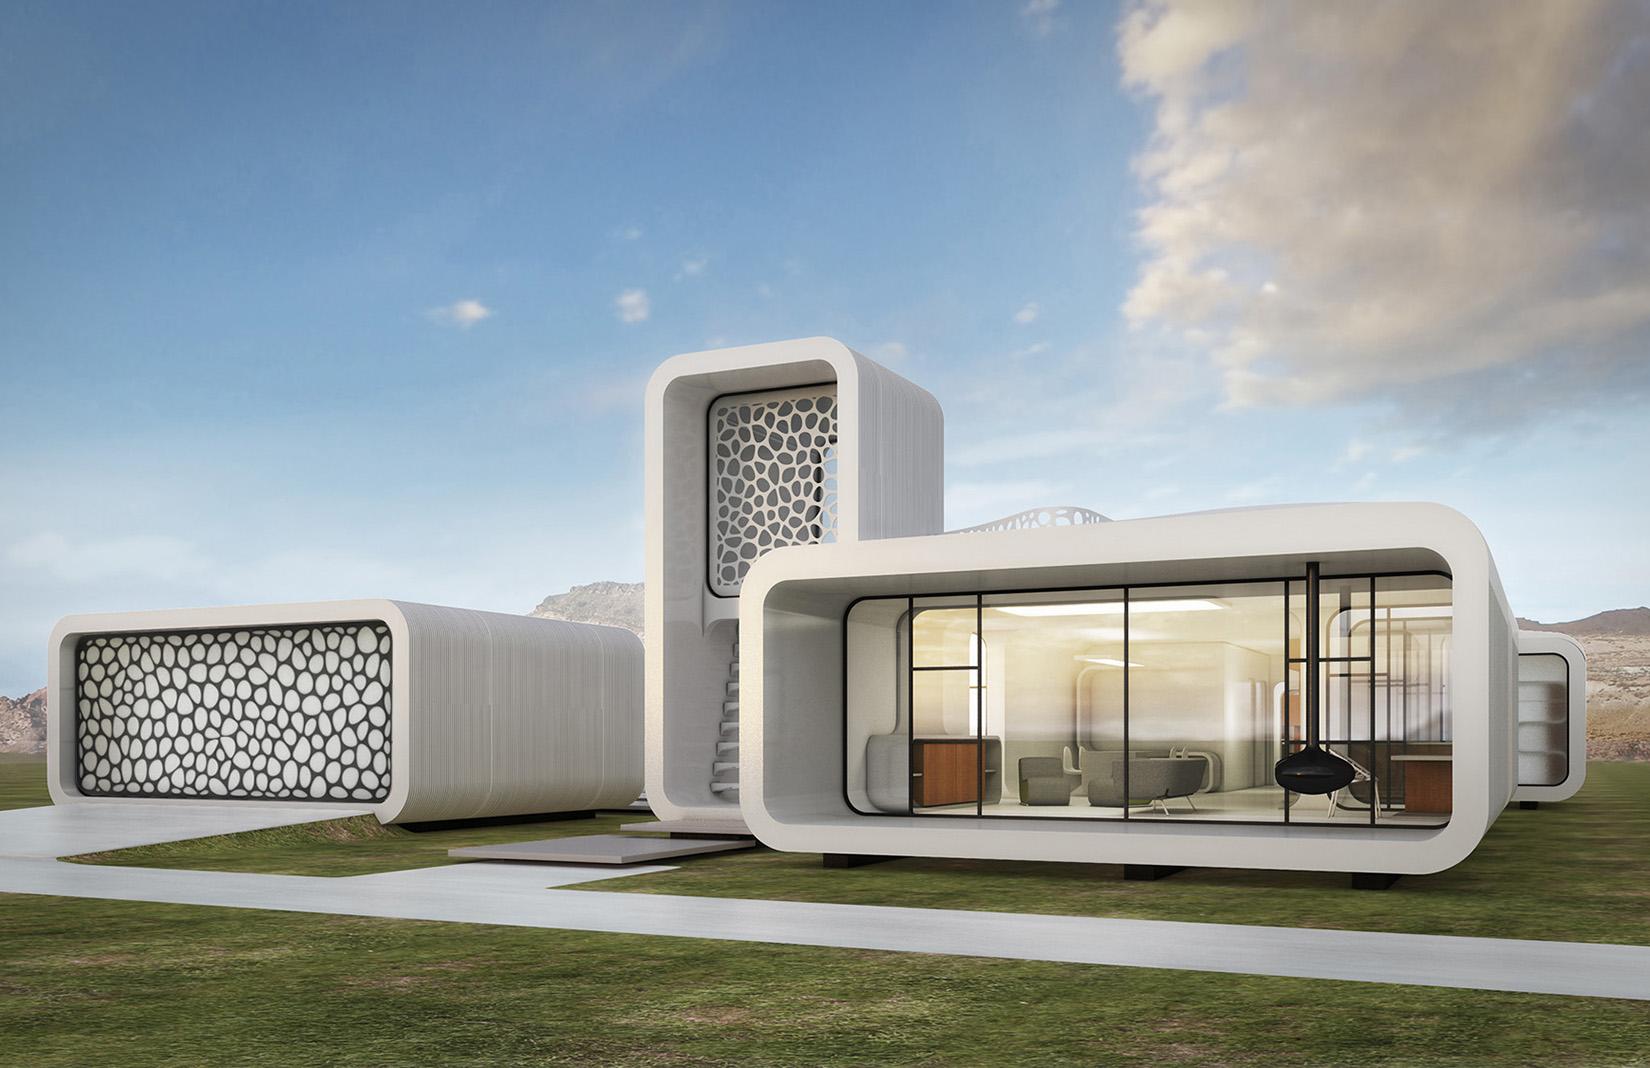 3D Printed Dubai Office Building